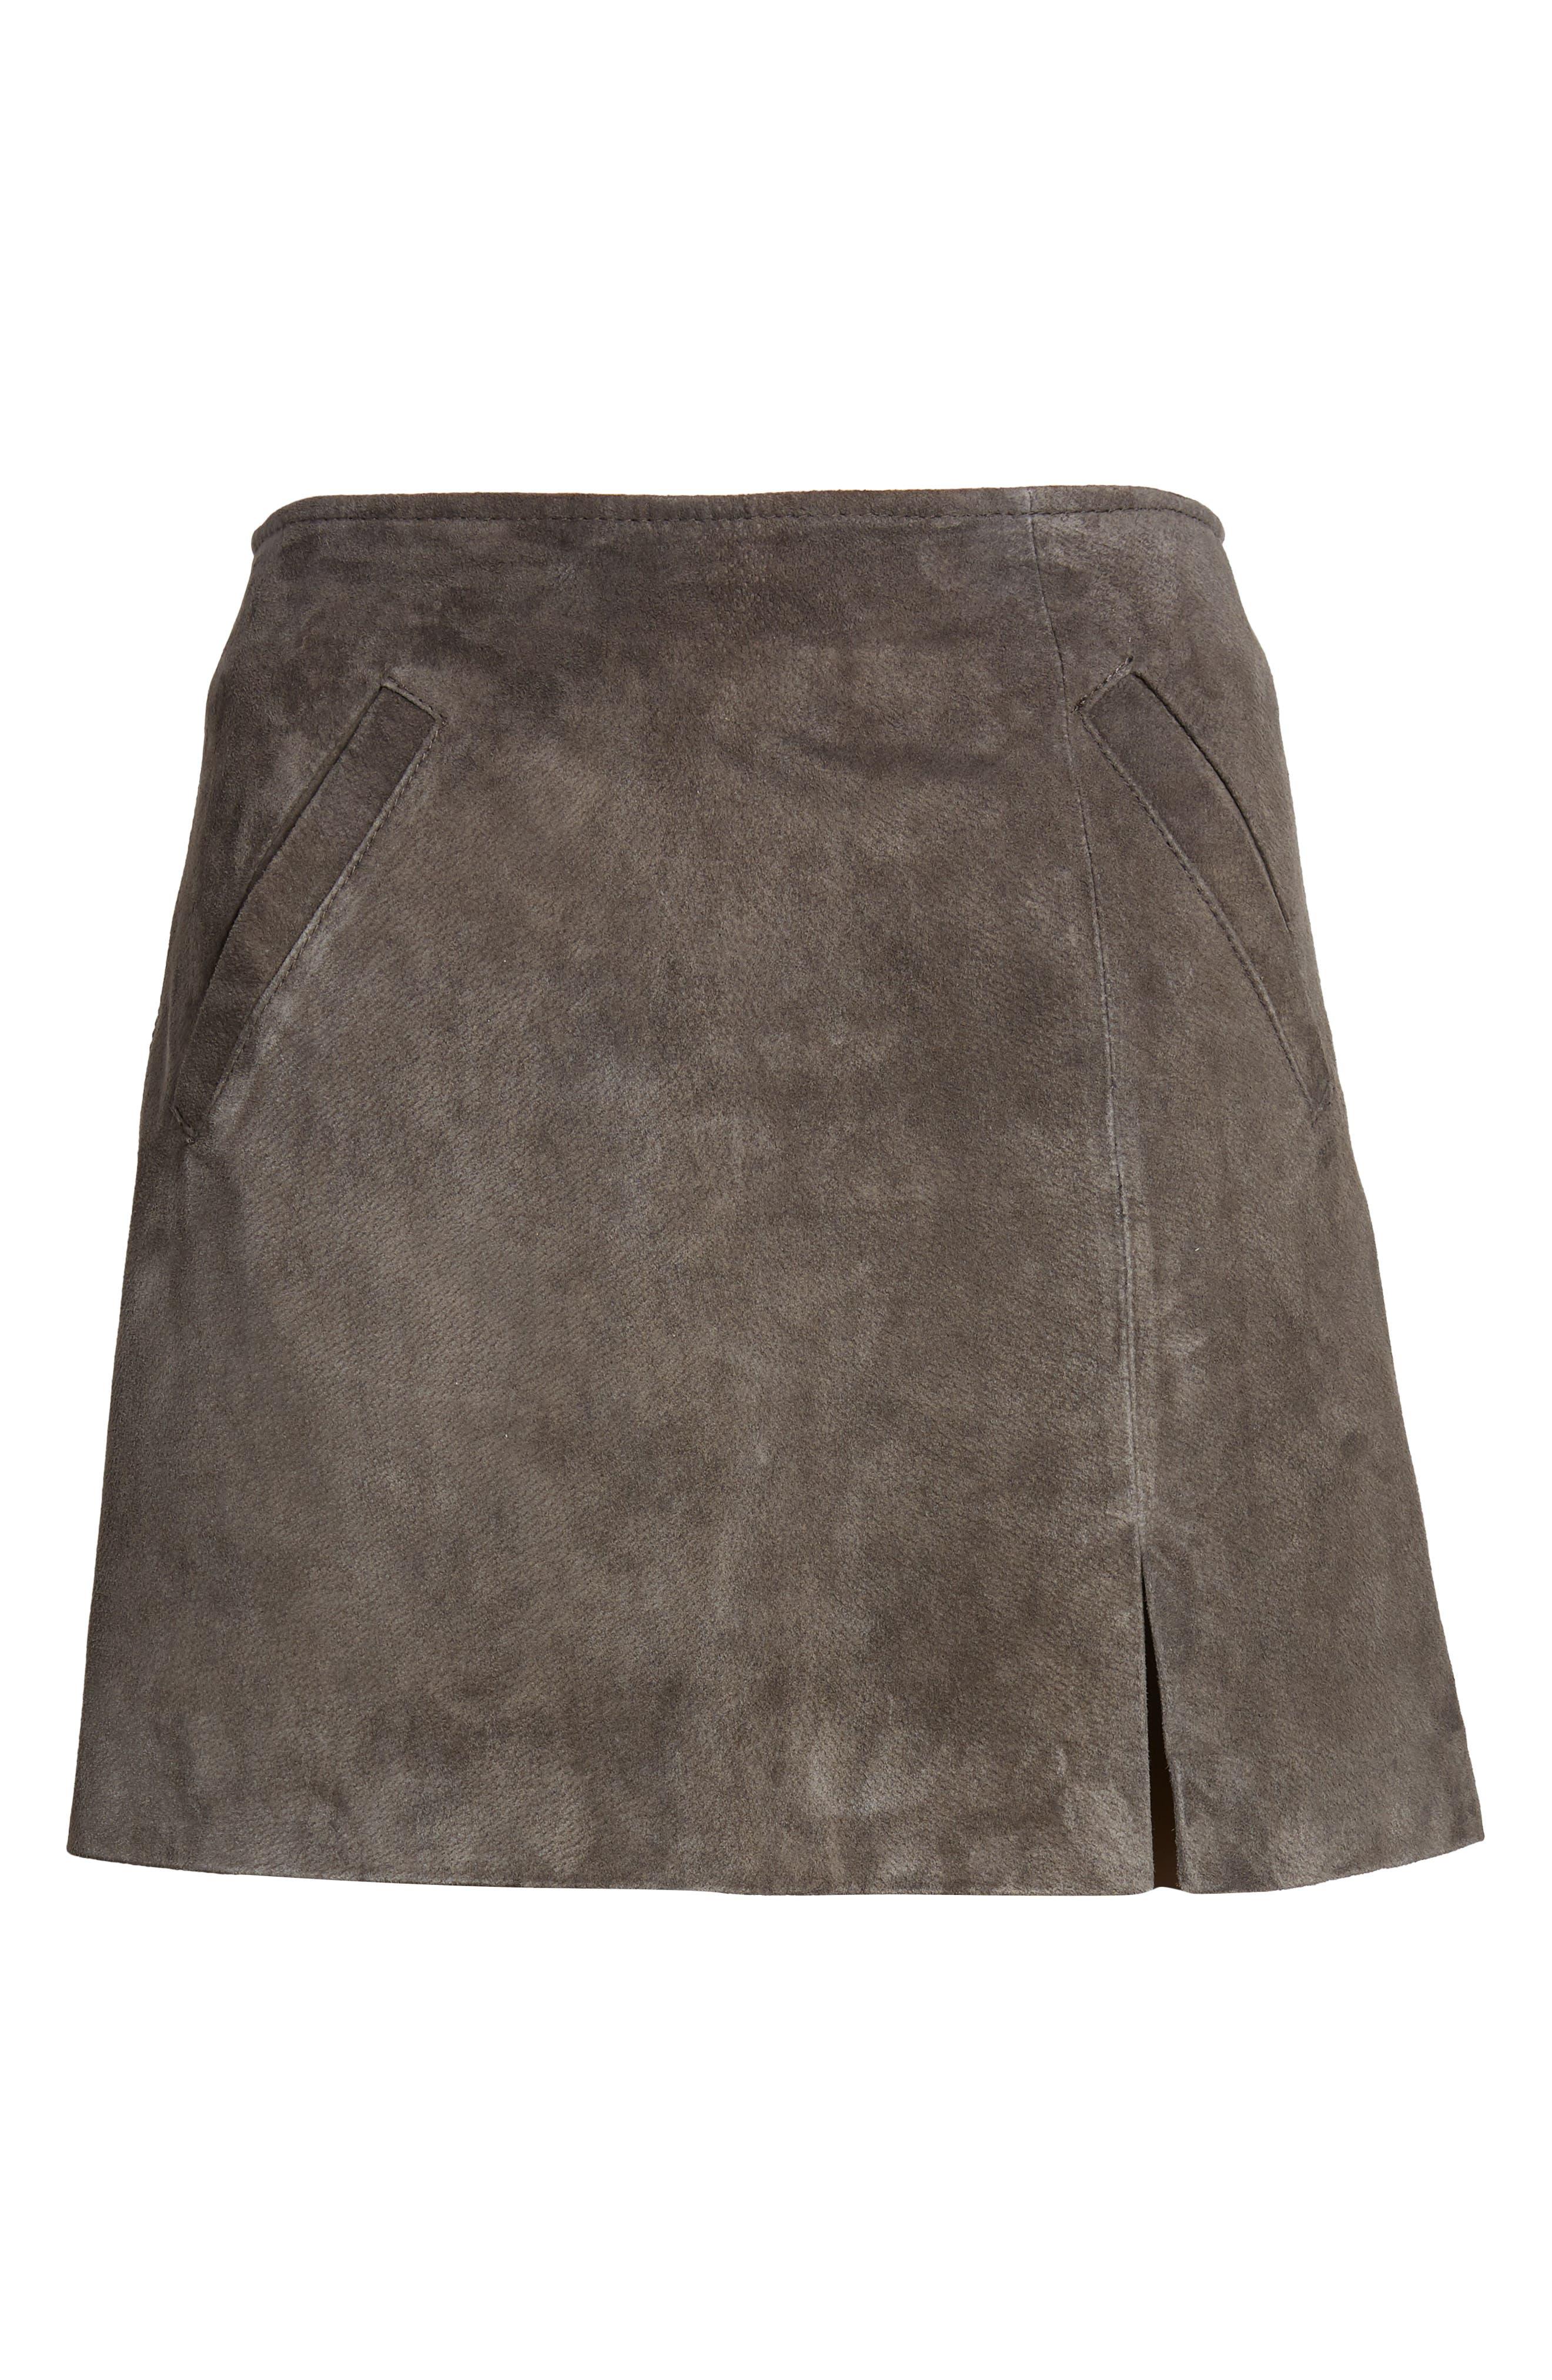 BLANKNYC, Suede Miniskirt, Alternate thumbnail 6, color, 020